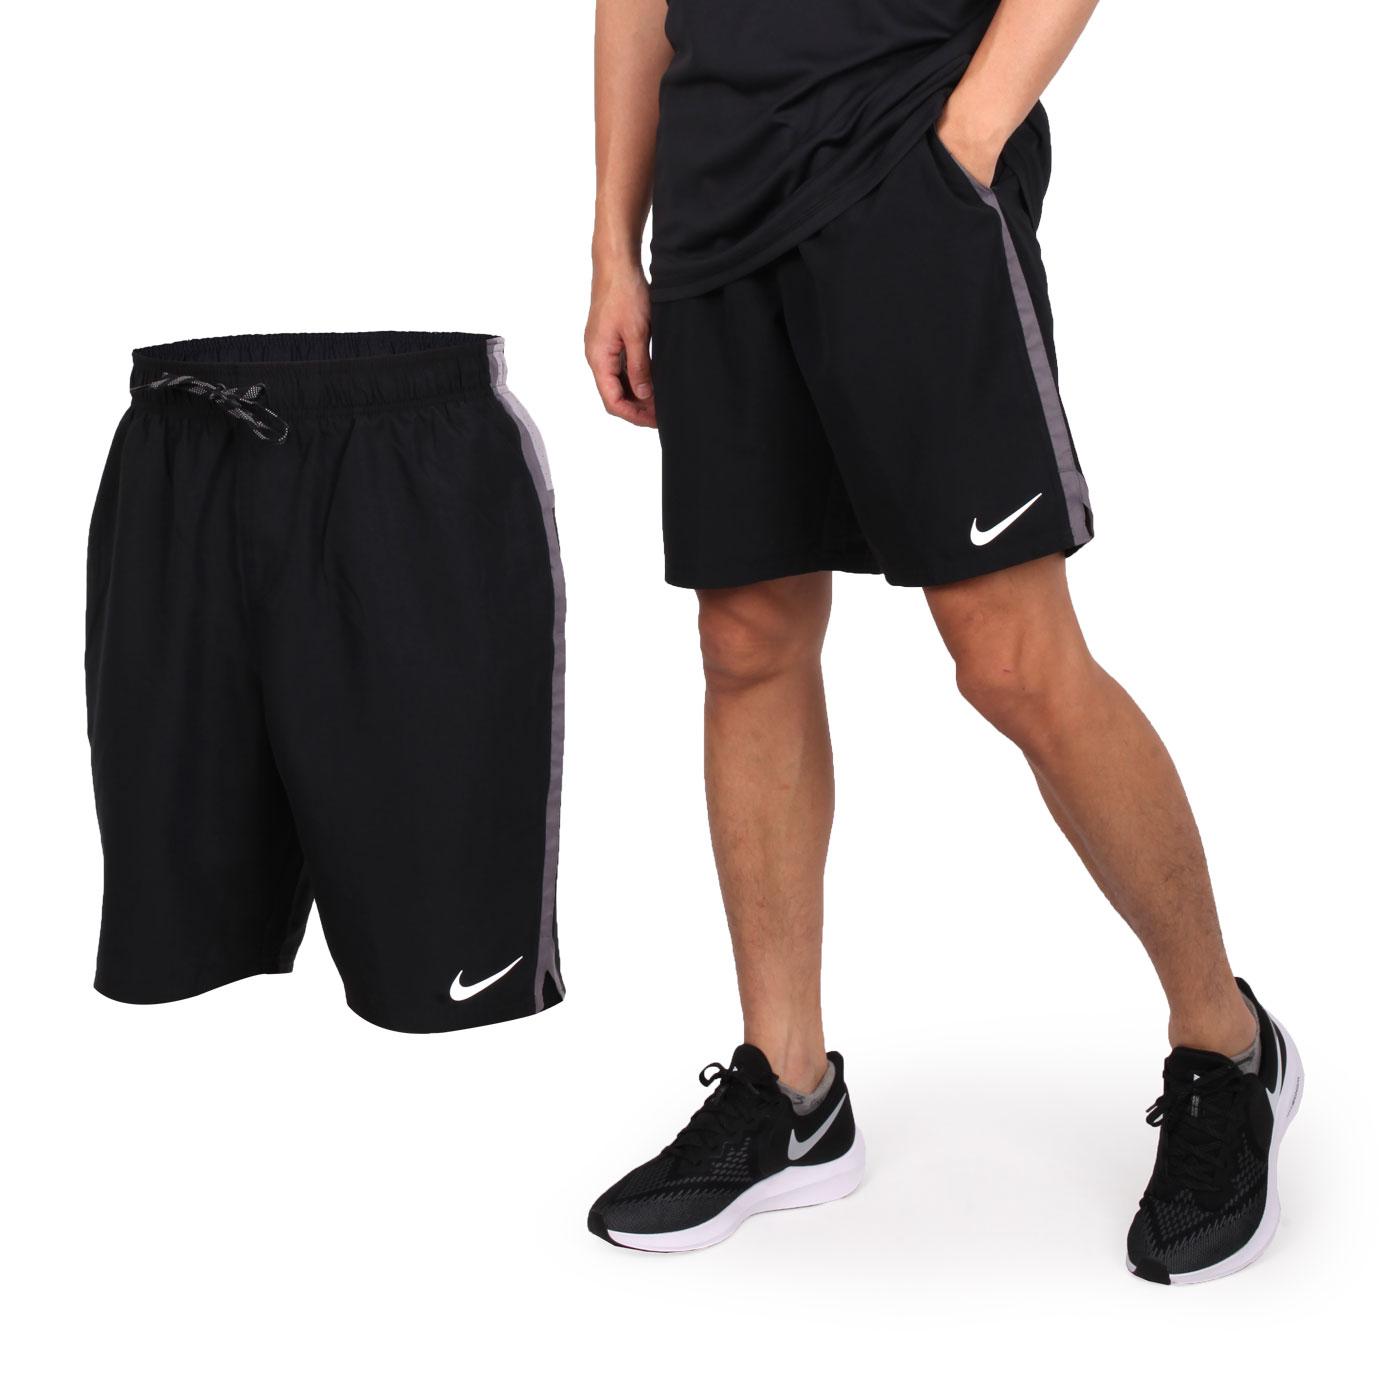 NIKE SWIM 男款9吋海灘褲 NESS9401-001 - 黑灰白